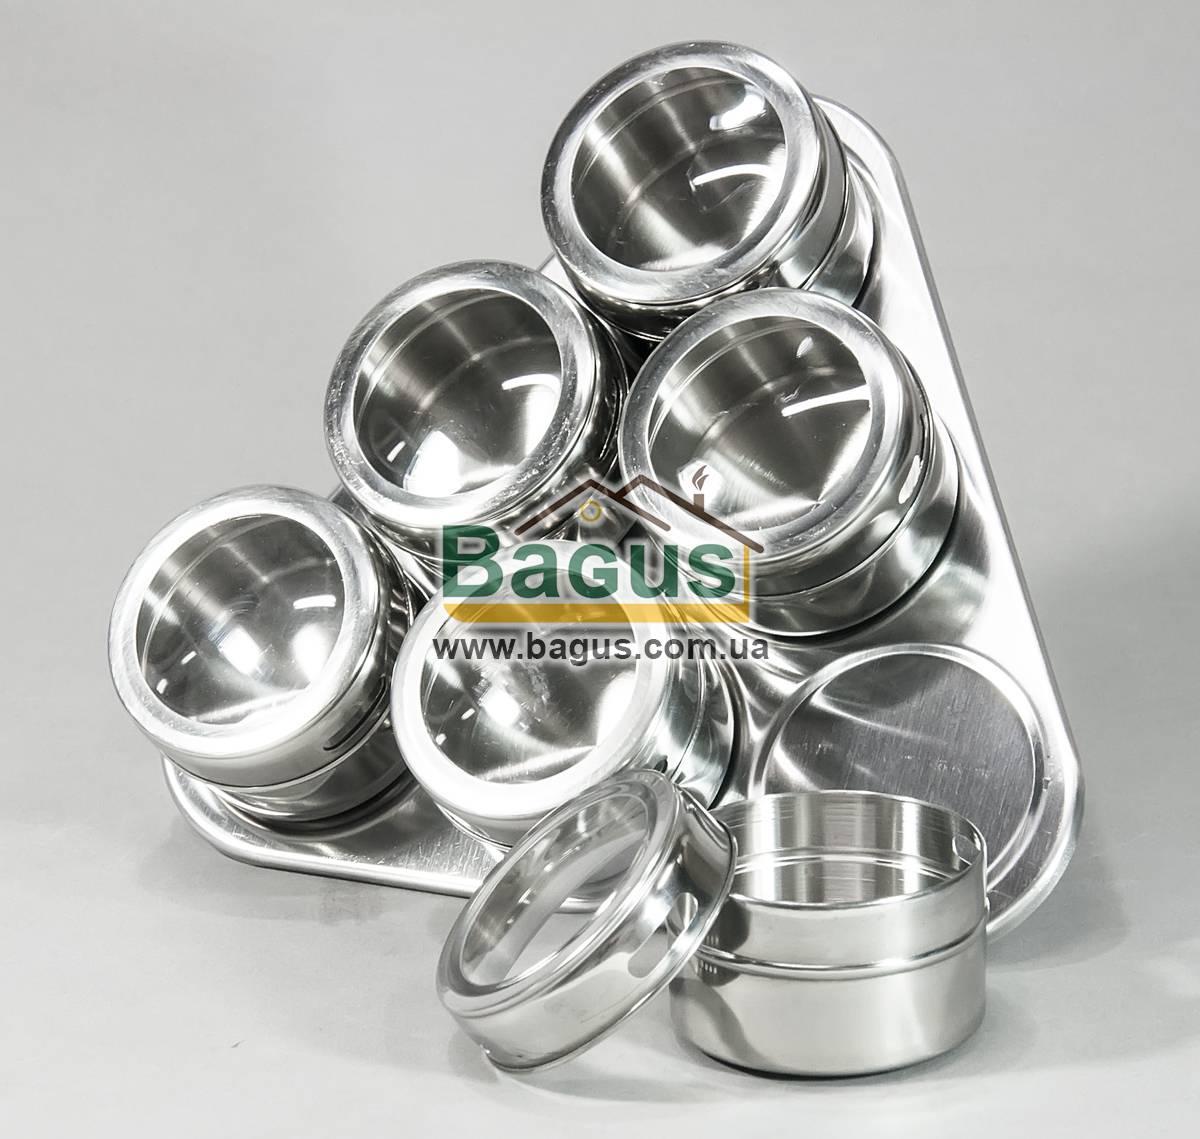 Набор емкостей для специй на магните с подставкой (6шт./наб.) Frico (FRU-458)